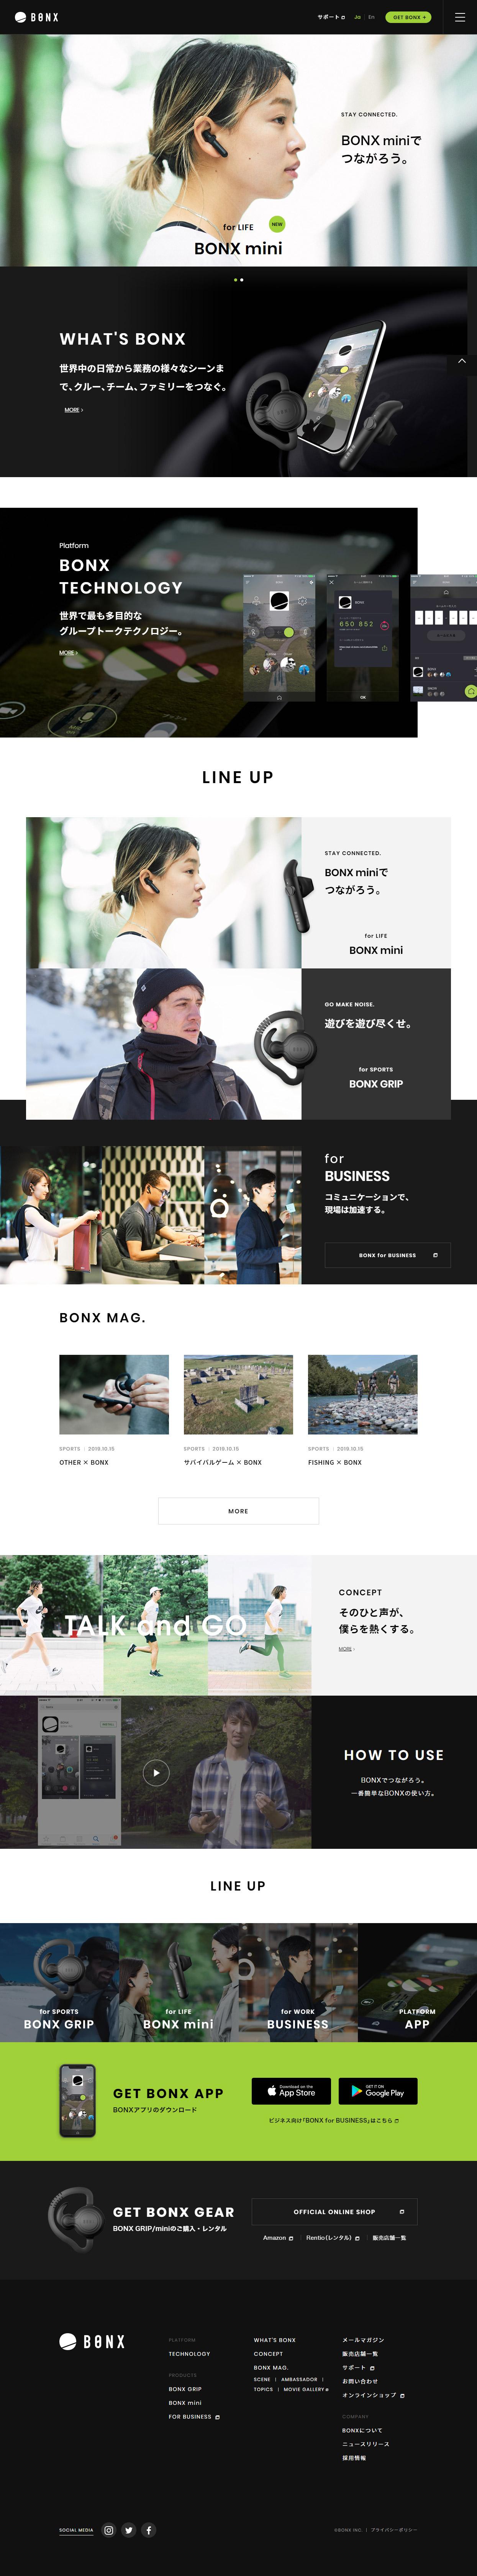 BONX公式ウェブサイト